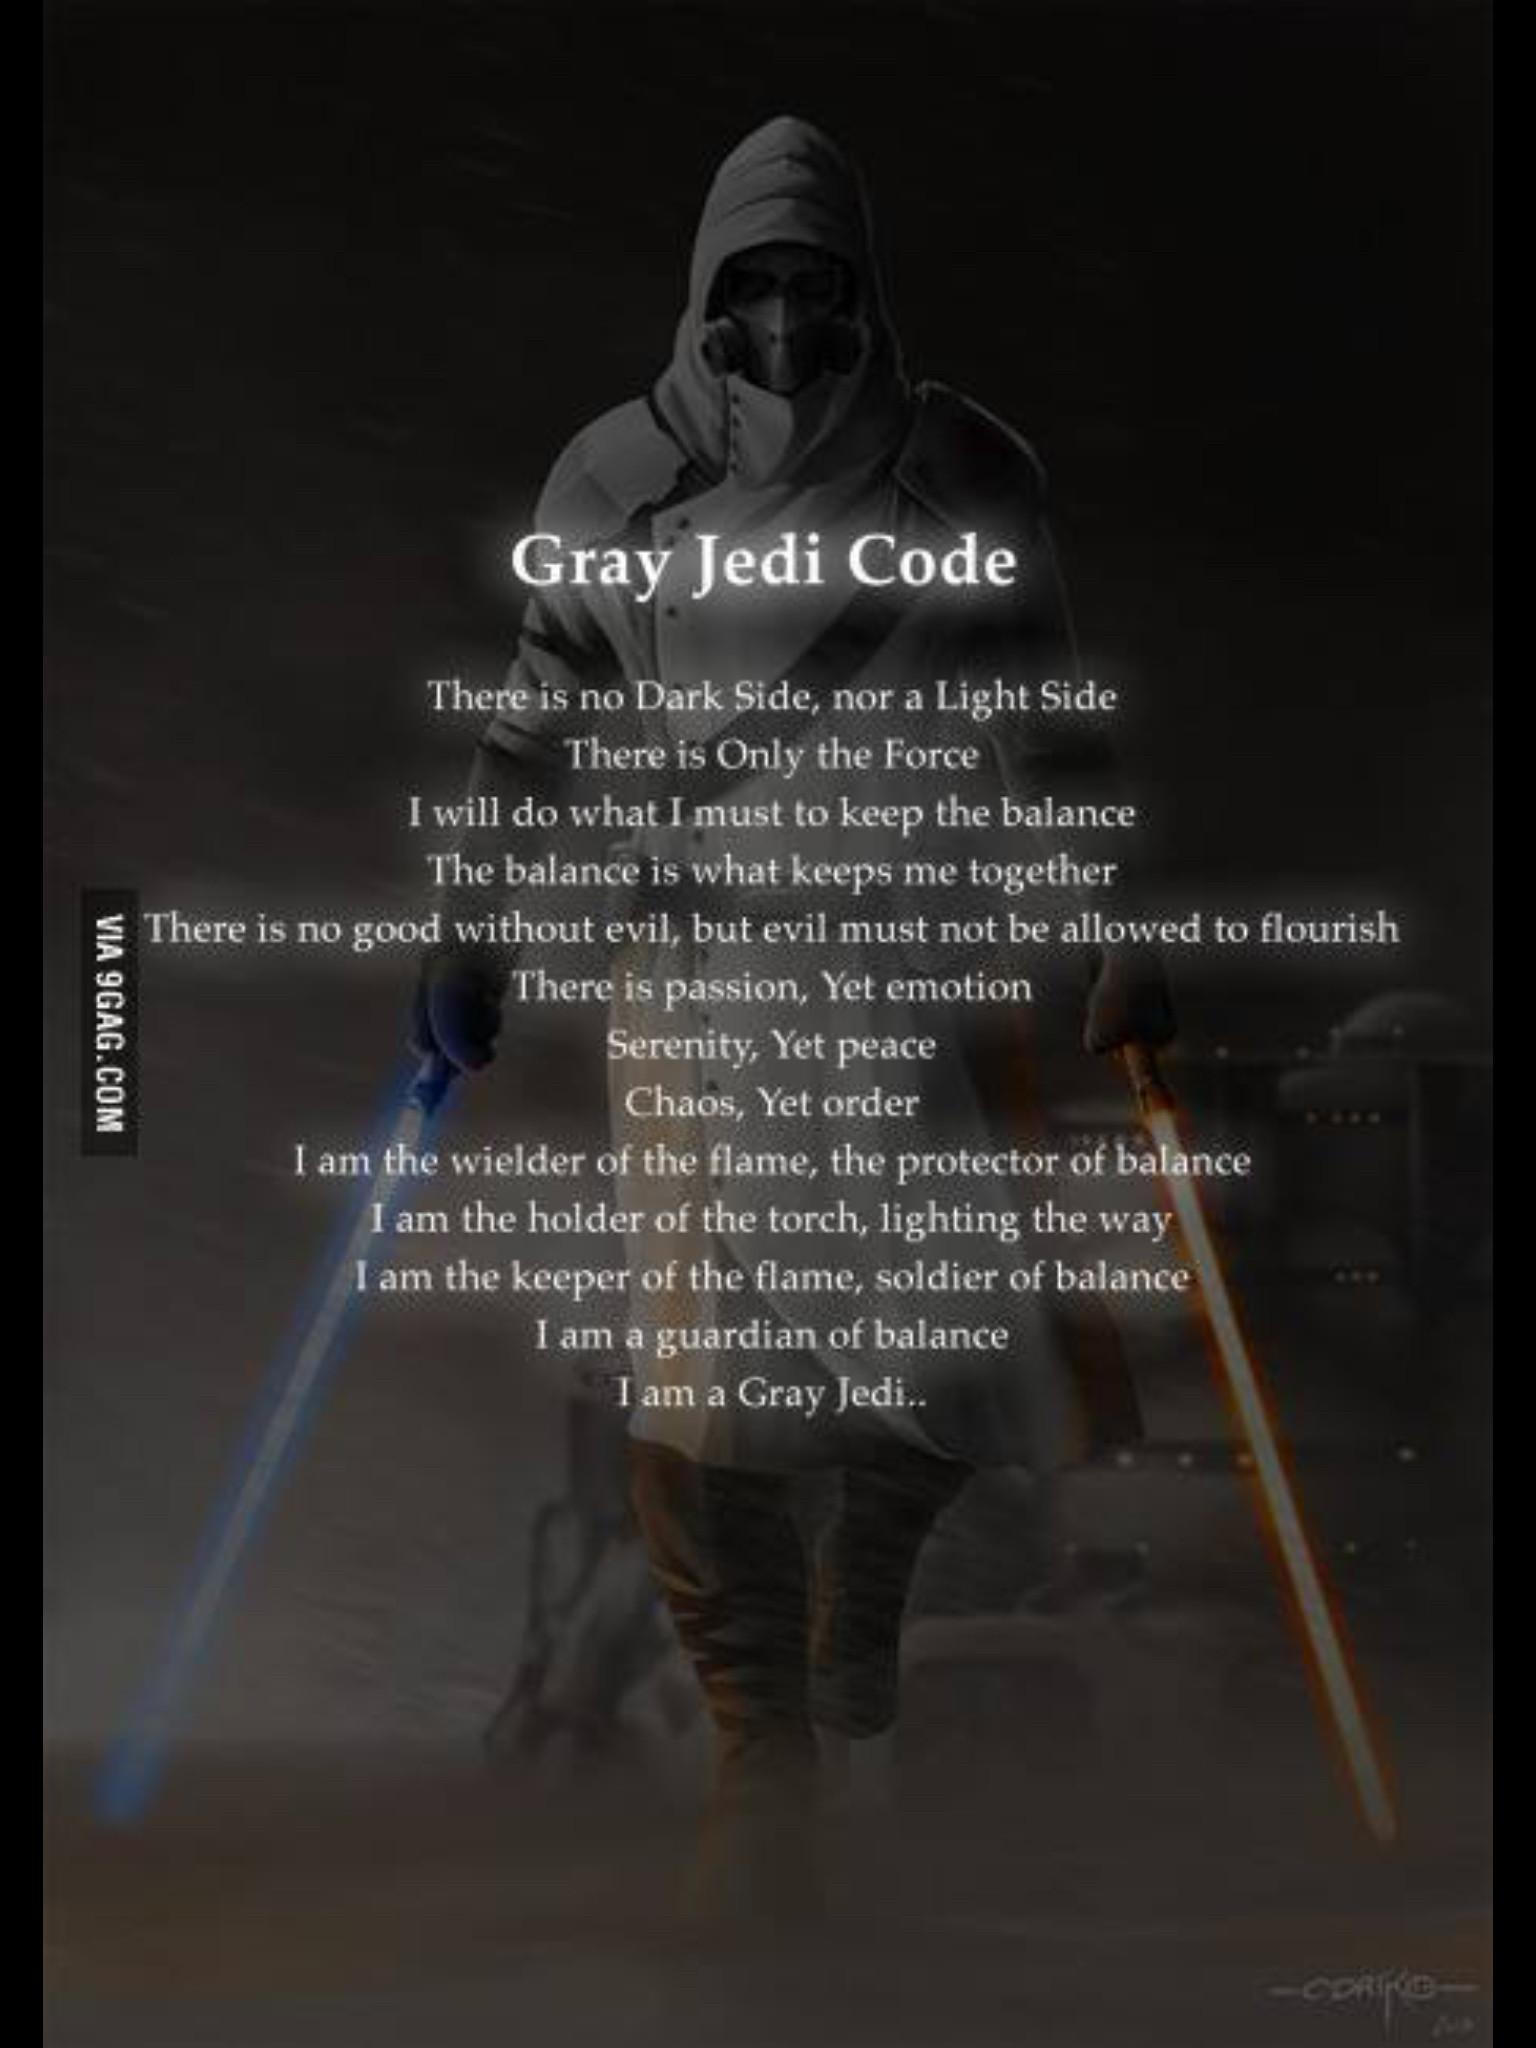 Grey Jedi Code